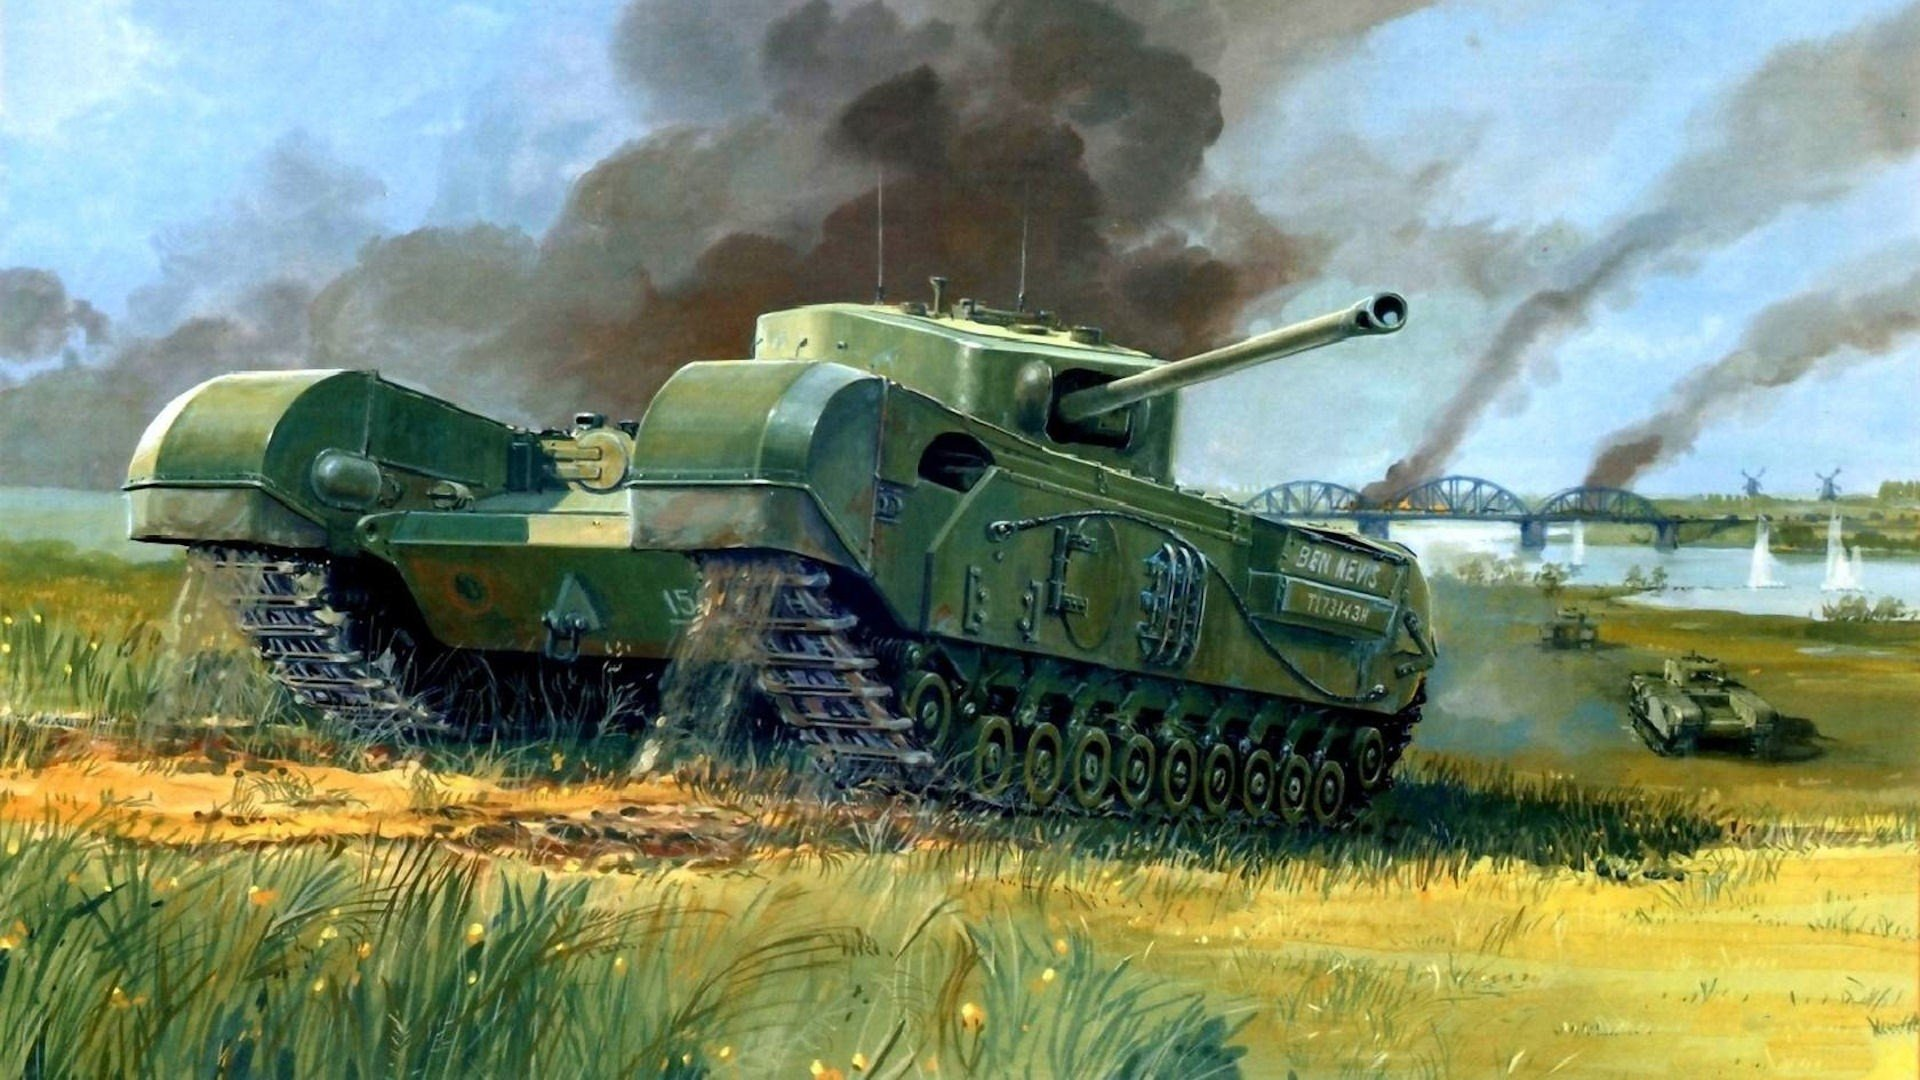 1920x1080 Infantry Tank Picture War Bridge Tank Drawing Hd Wallpaper